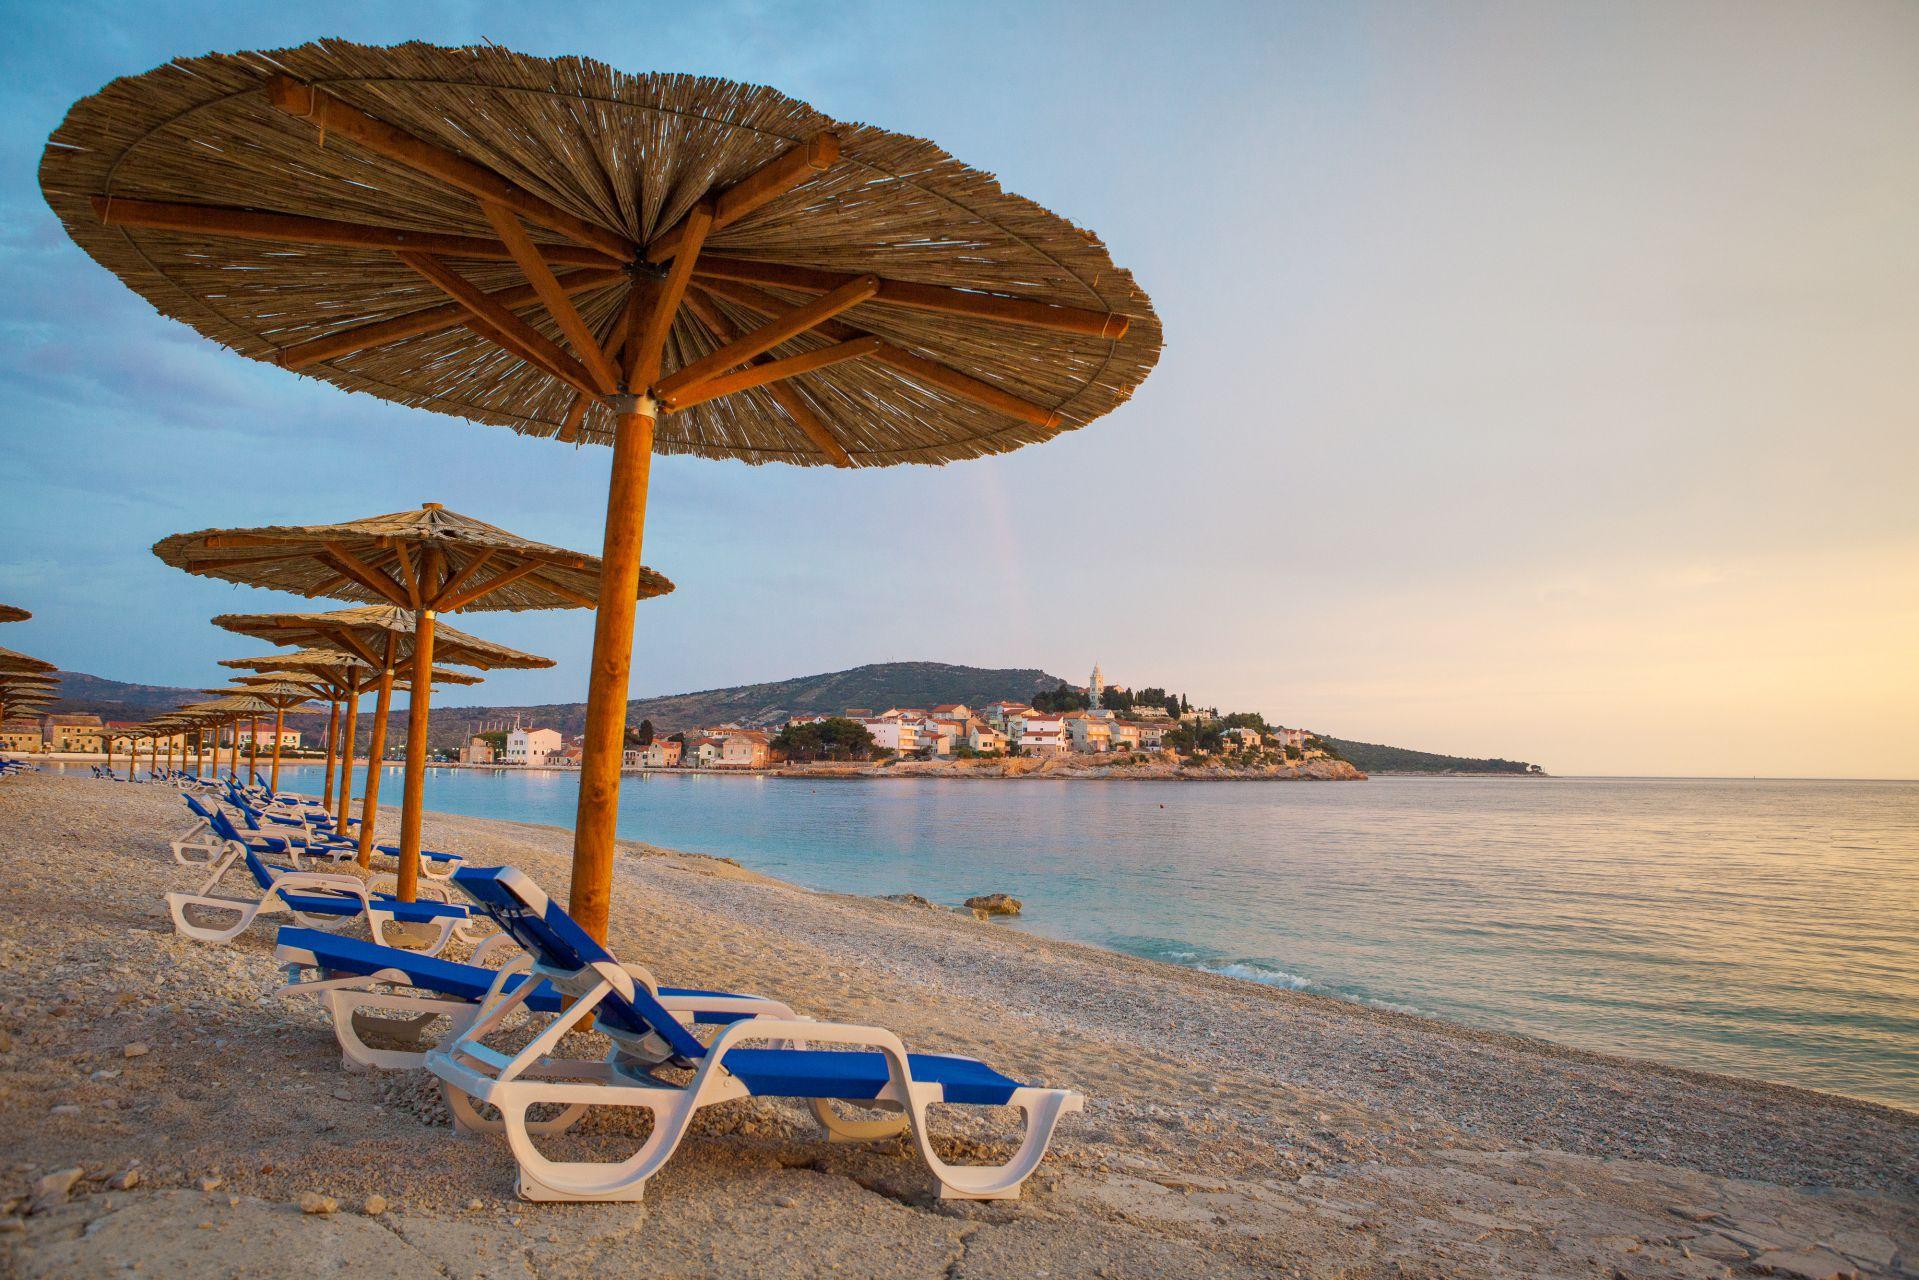 beach 07 14638501600 o - Zora Hotel